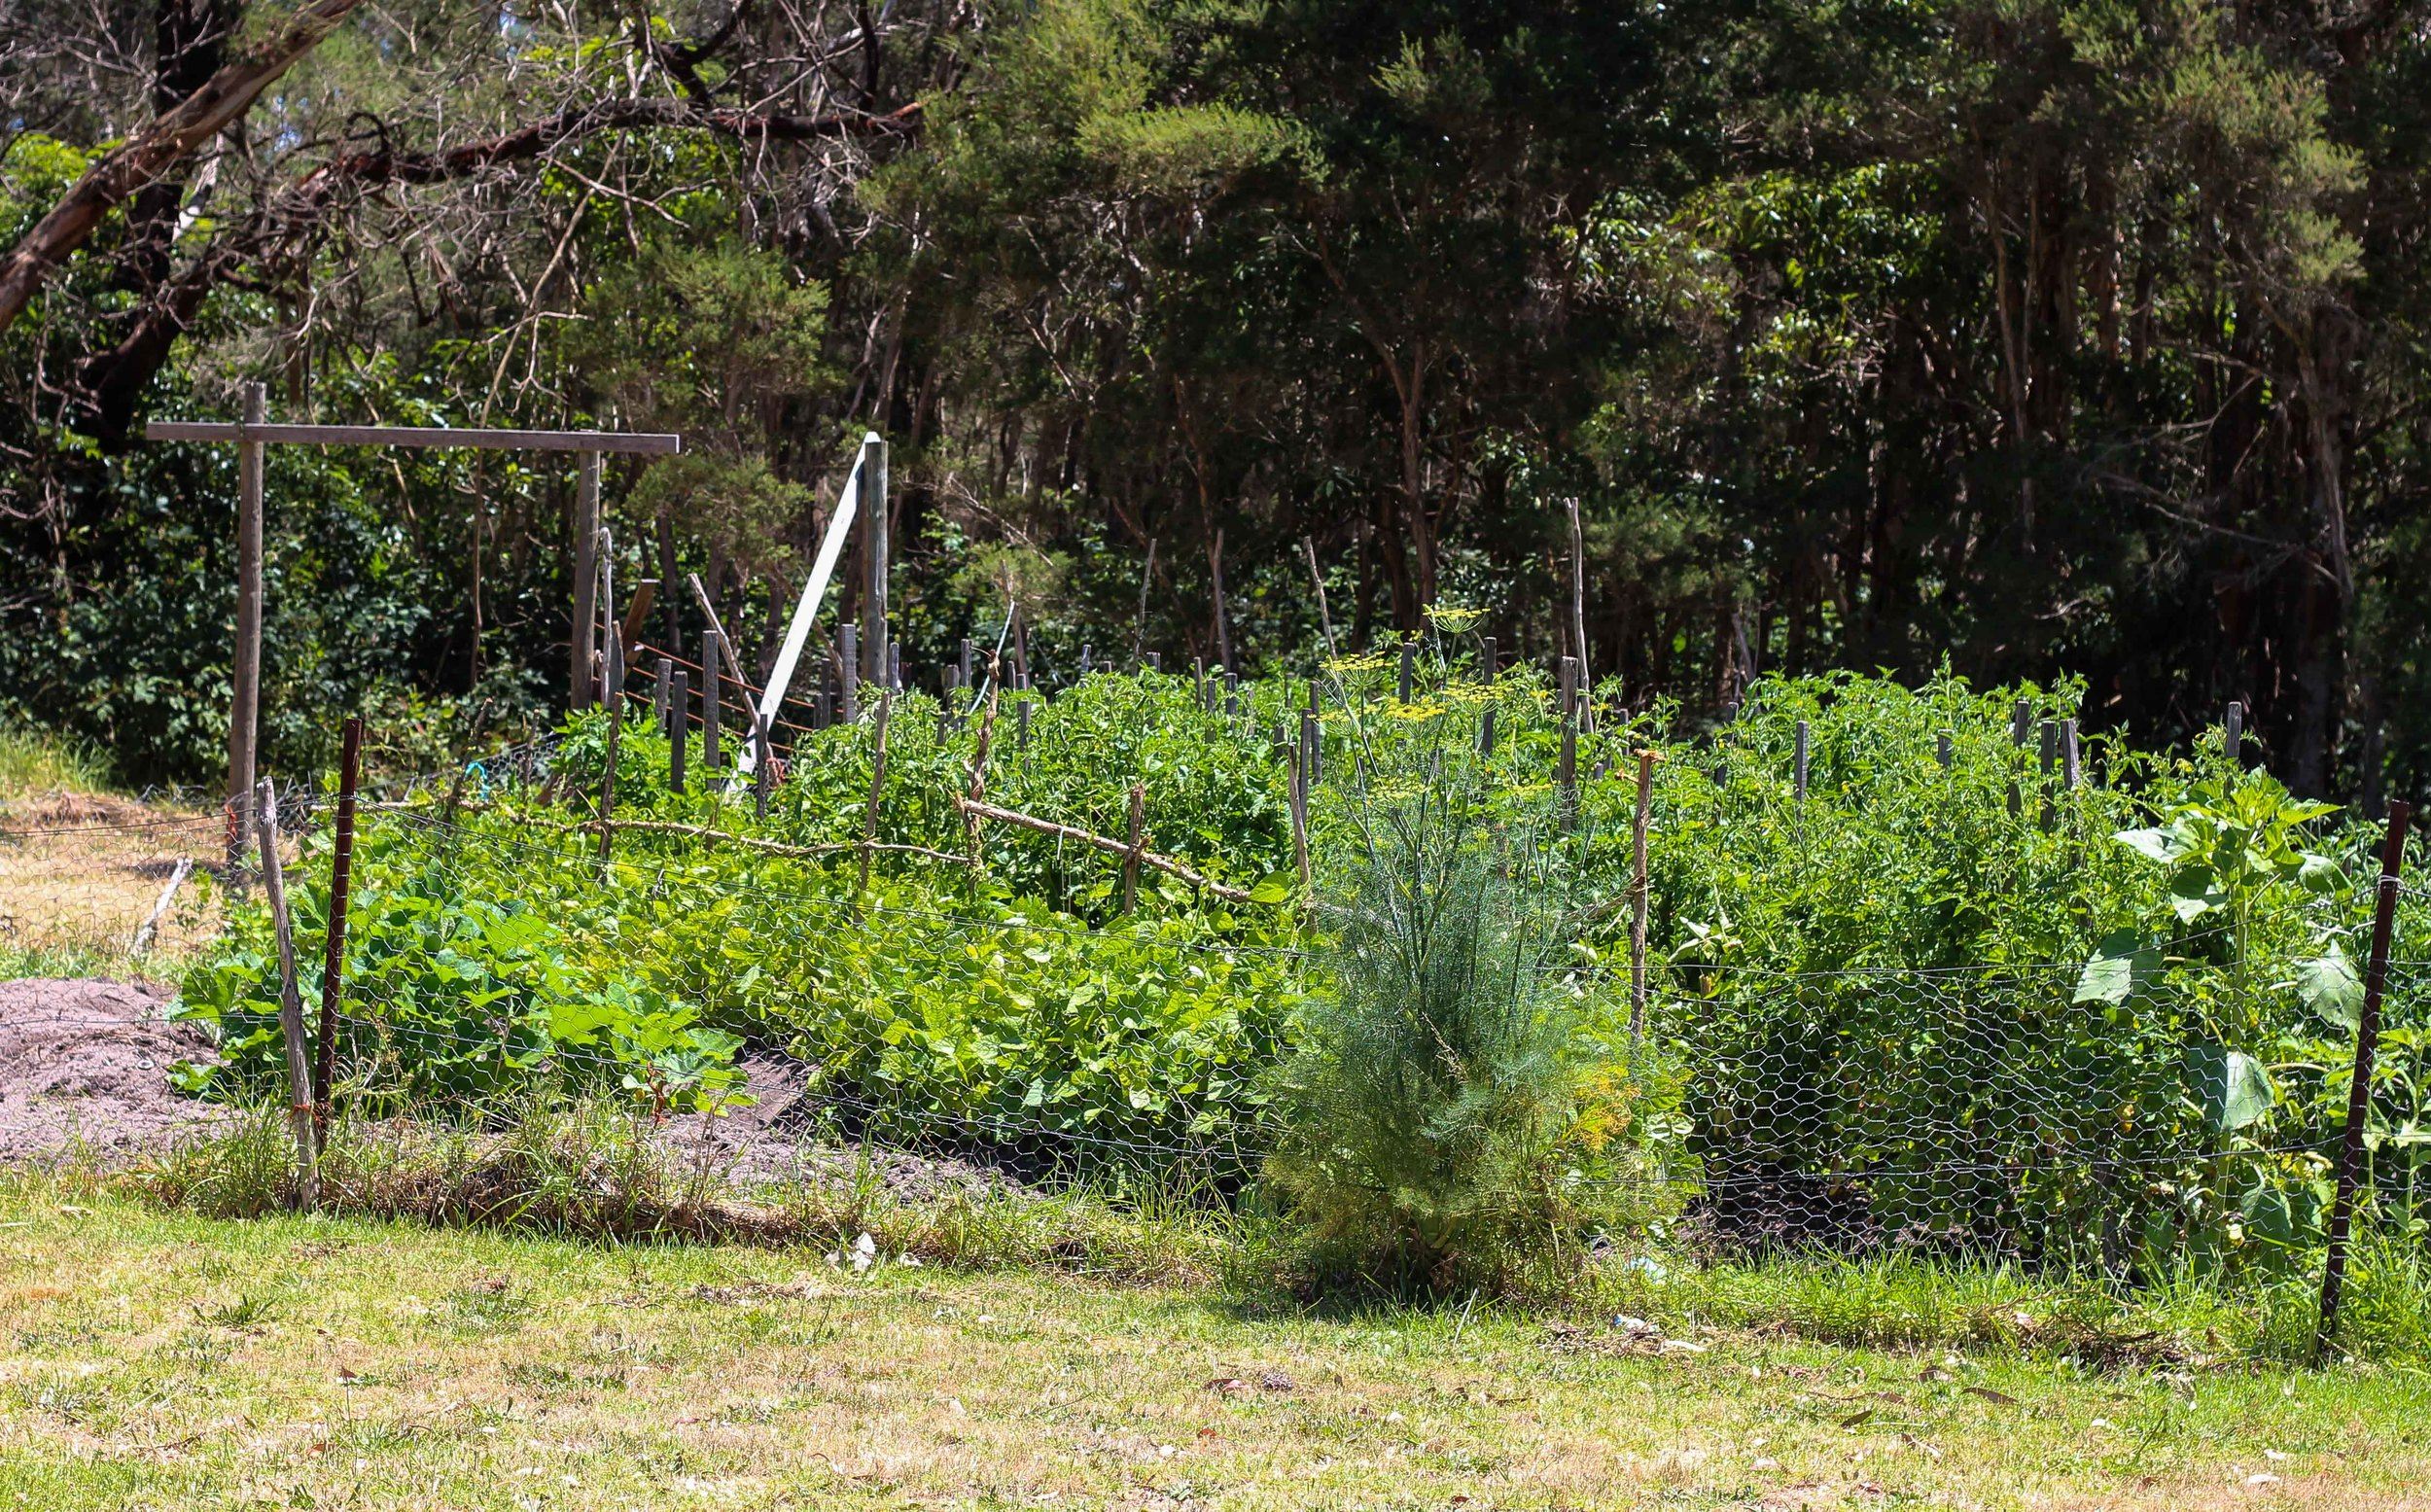 Our tangly, plentiful veggie garden!